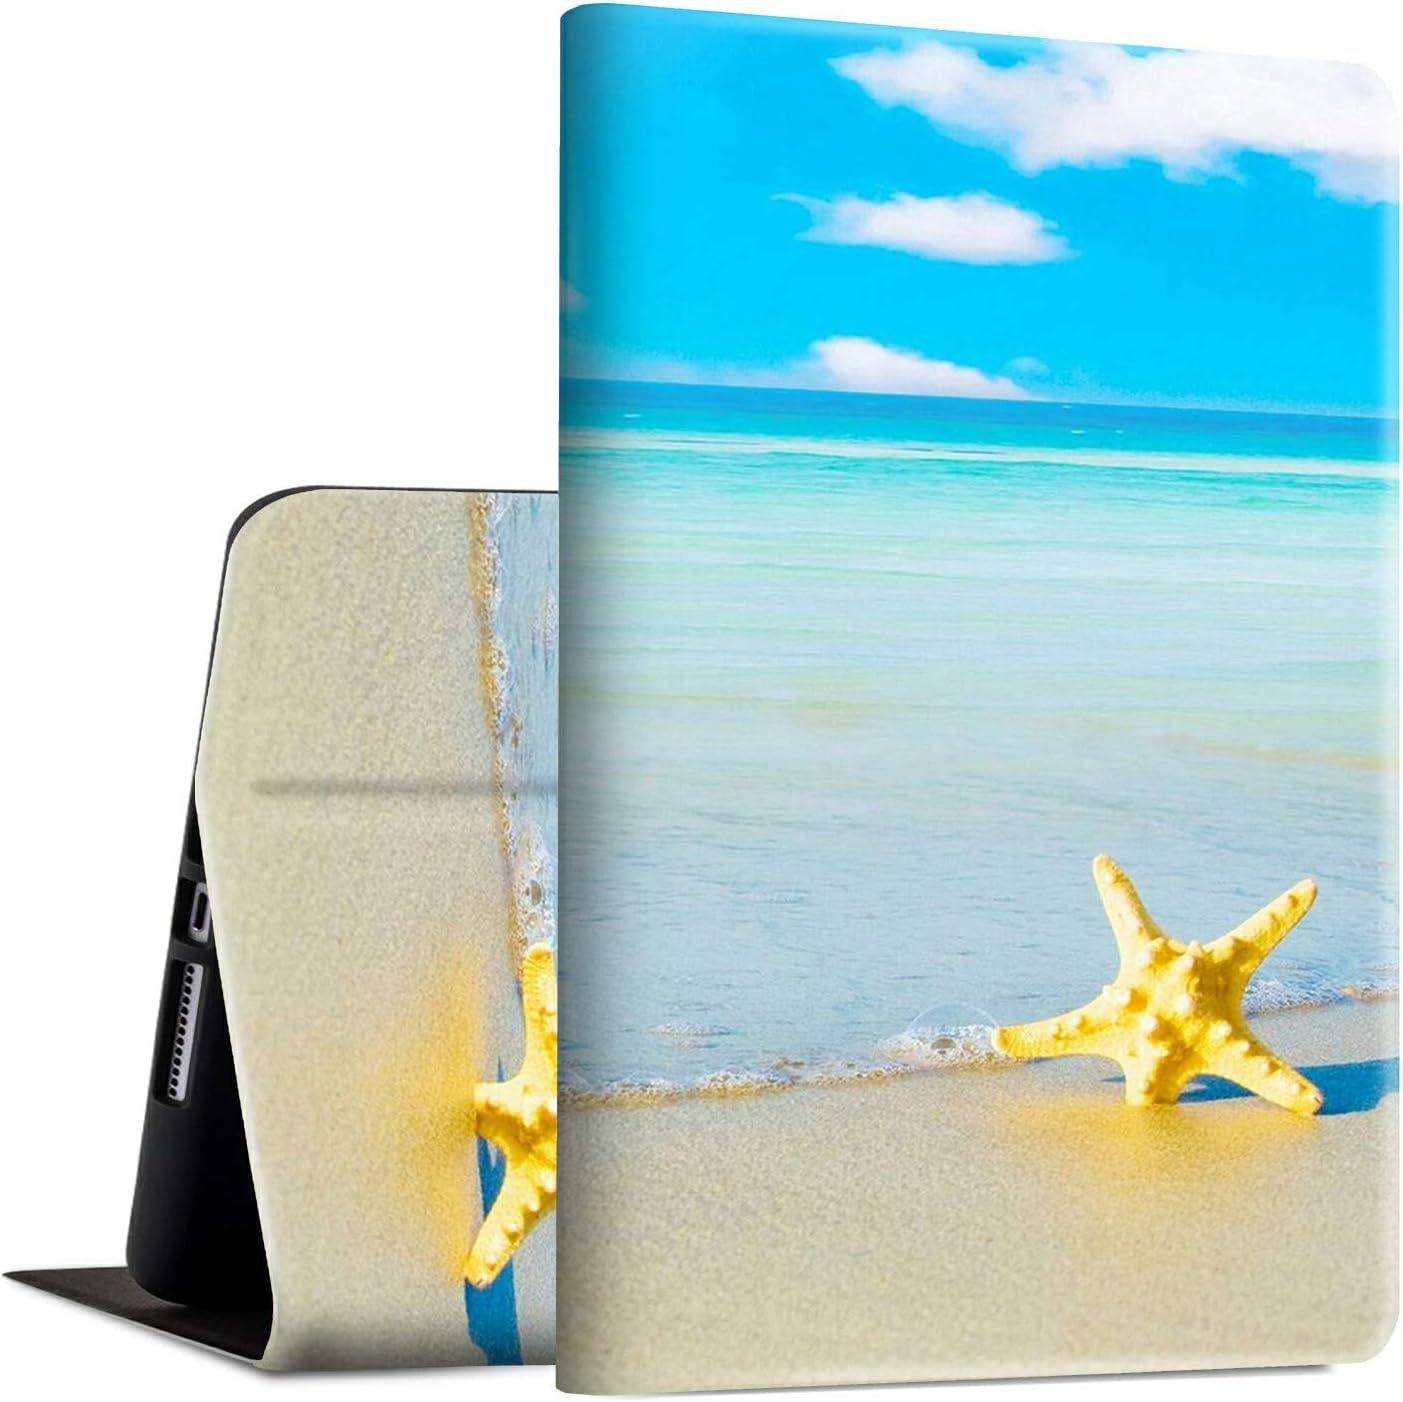 iPad Sale 2 3 4 Case Rossy PU Leather free Folio Shock Cover Protec Smart